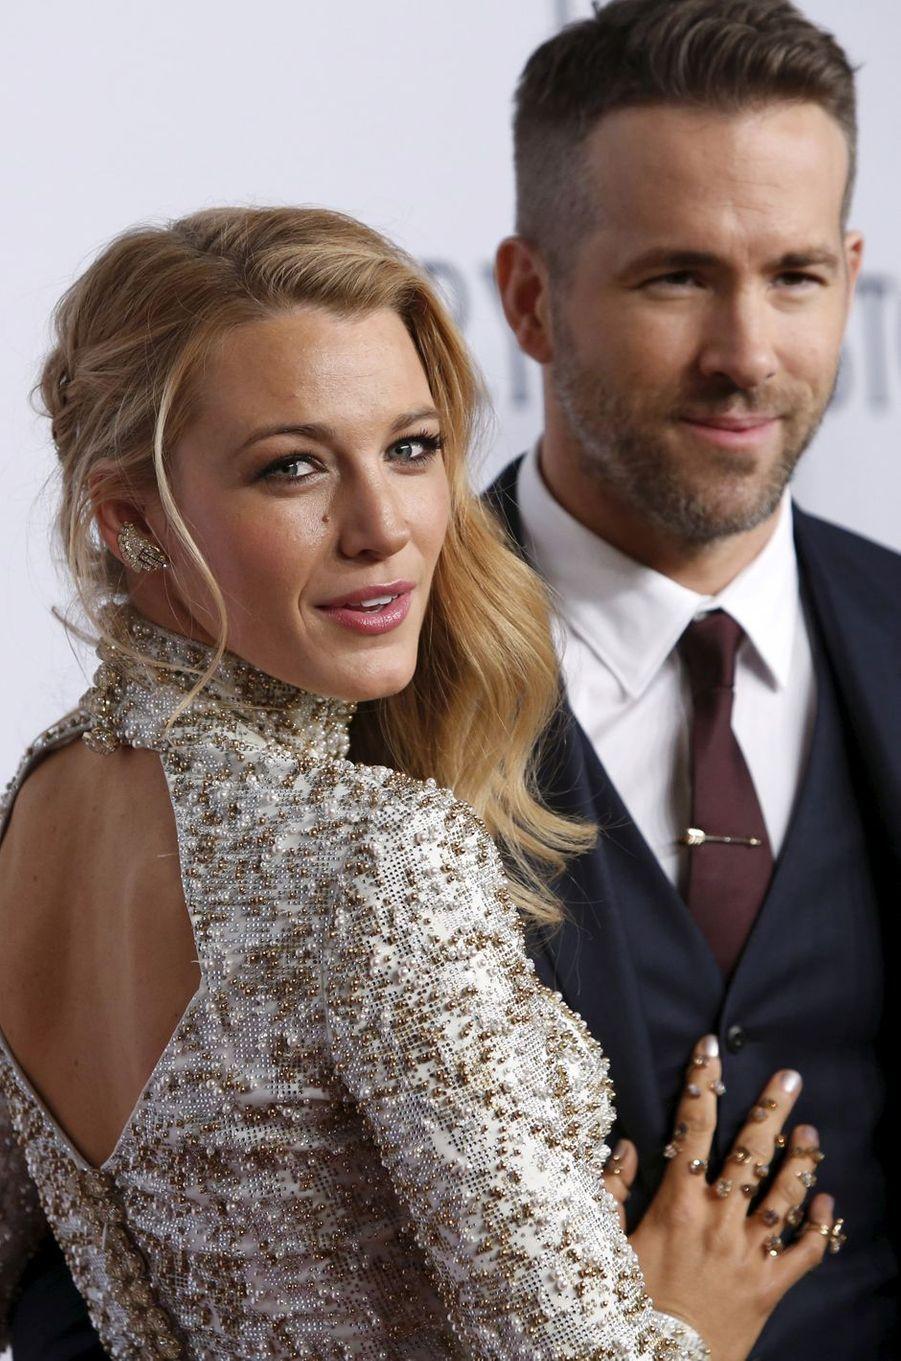 Blake Lively et Ryan Reynolds à New York le 10 février 2016